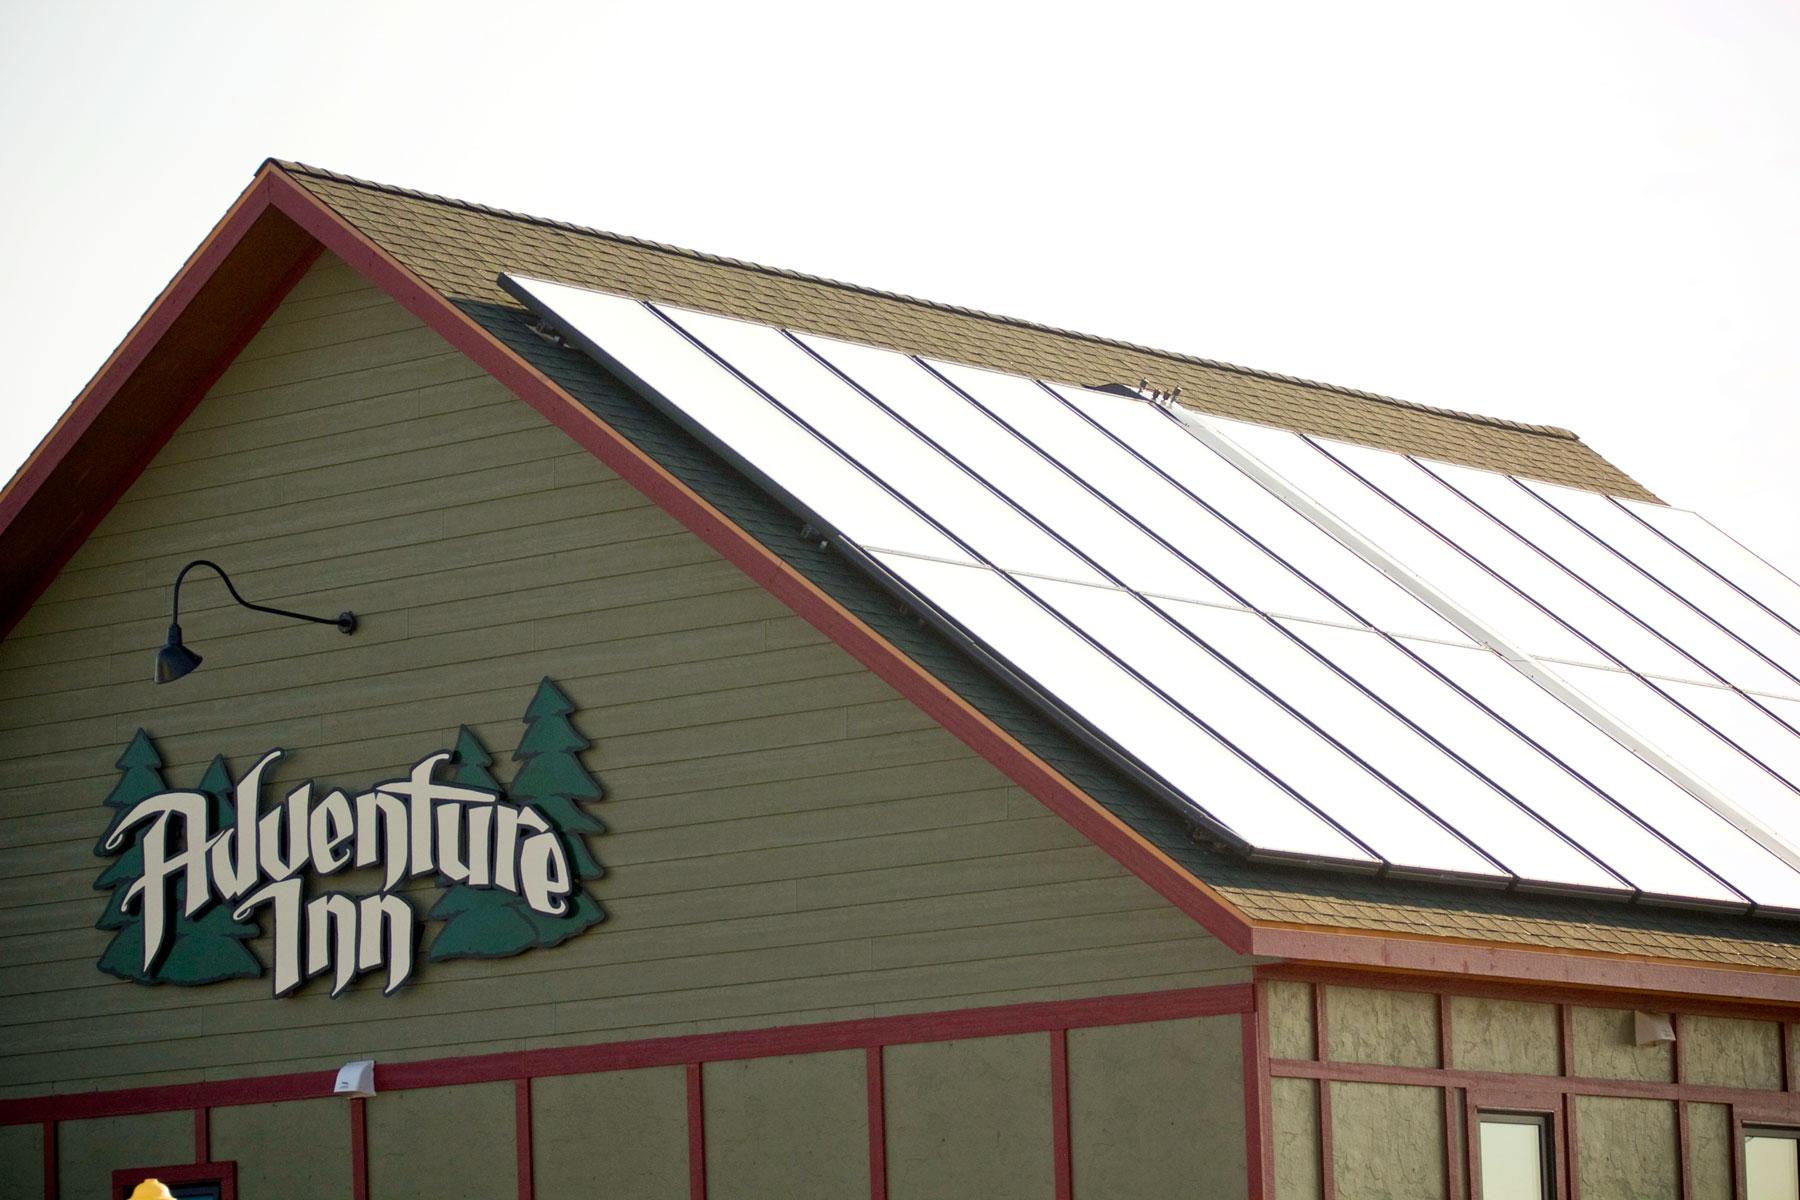 Solar Panels on the main building of the Inn